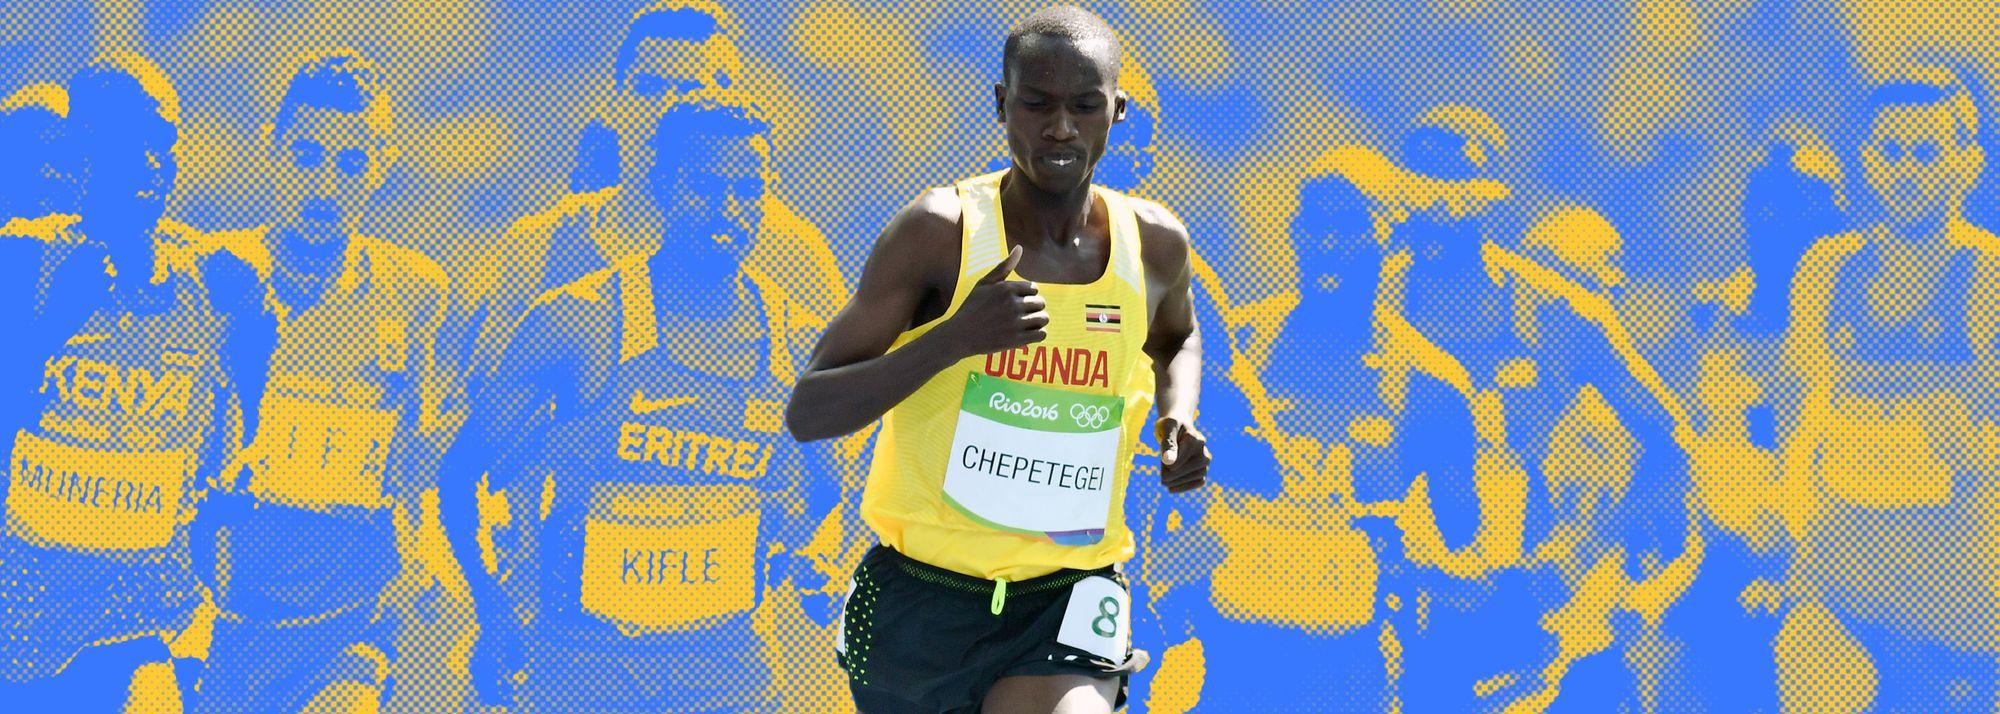 The world 10,000m champion explains why he runs